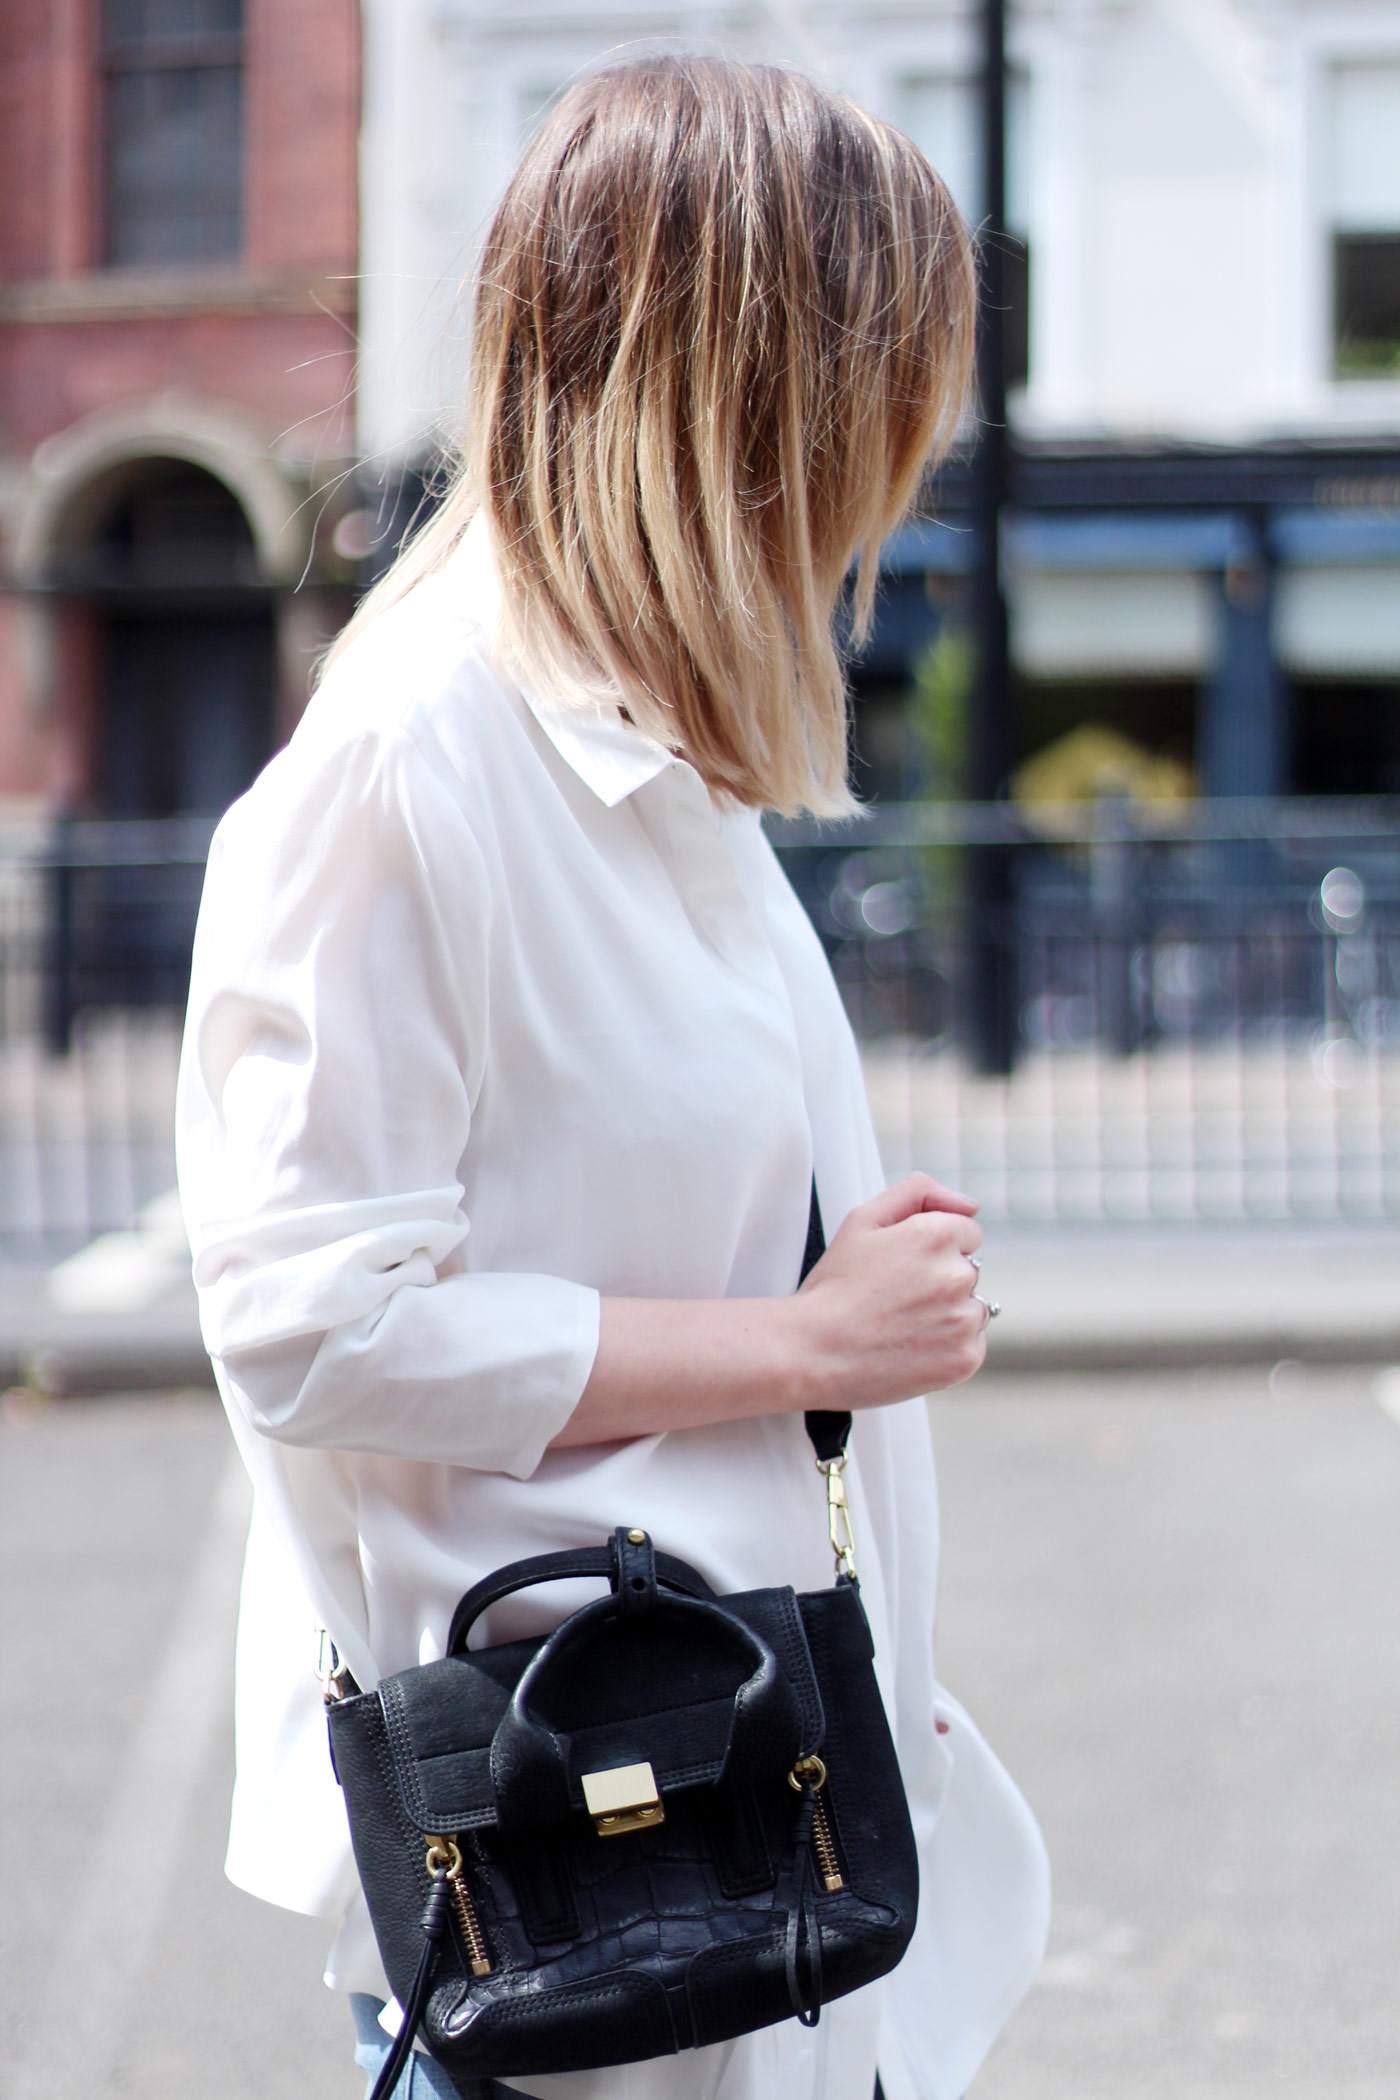 kurt-geiger-suede-peep-toe-boots-7FAM-jeans-COS-white-shirt-phillip-lim-pashli-mini-9